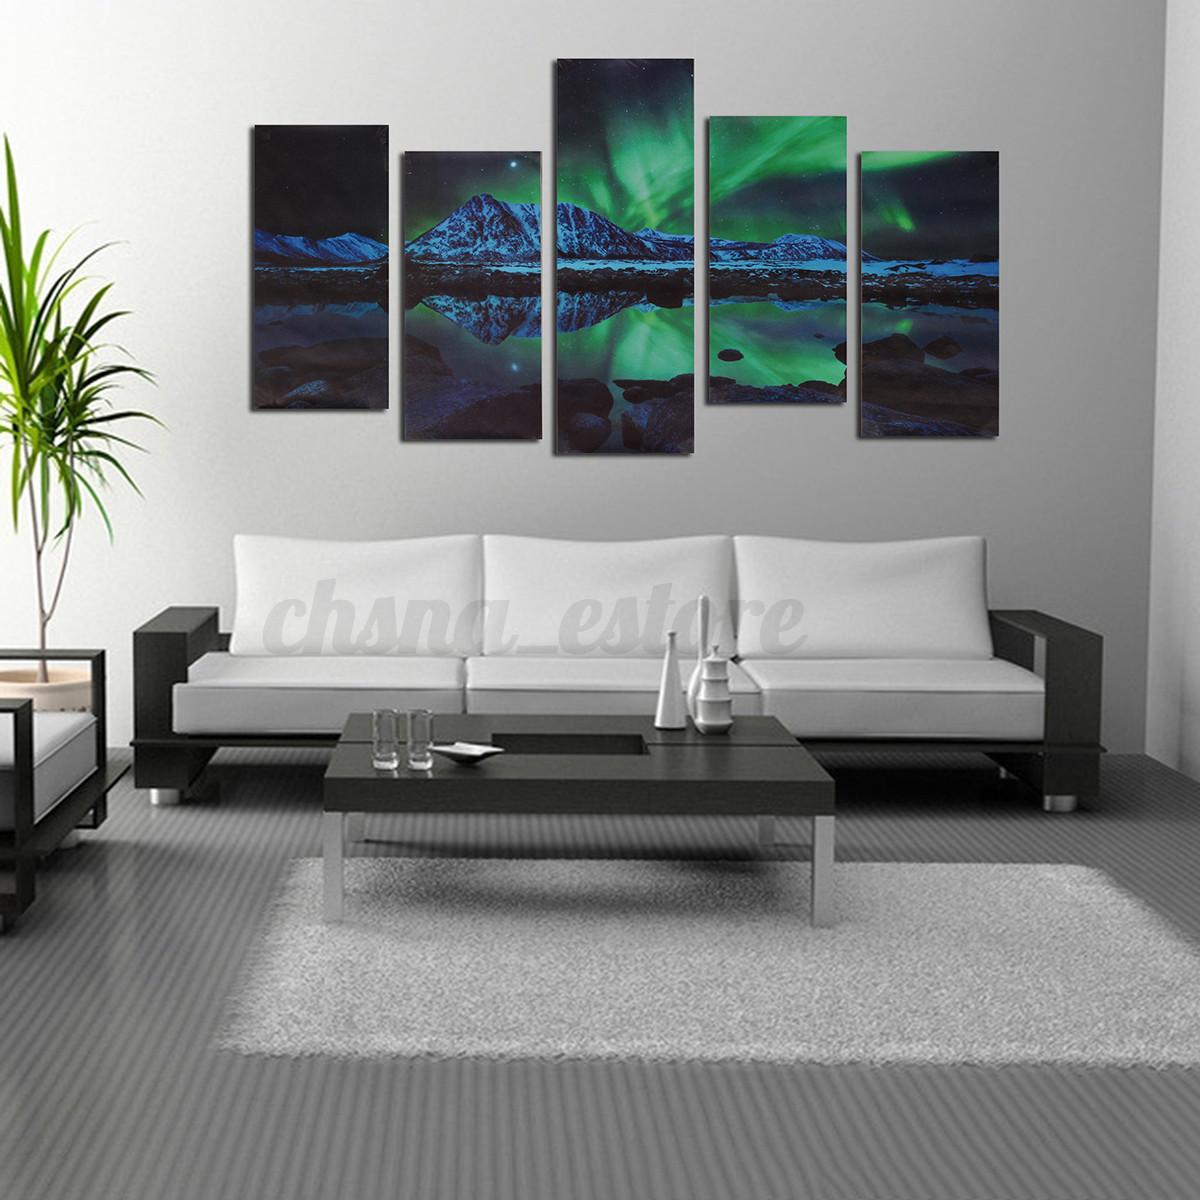 Grande-Lona-Moderno-Pintura-Si-Sin-Marco-Print-Lienzo-Cuadro-Hogar-Decoracion